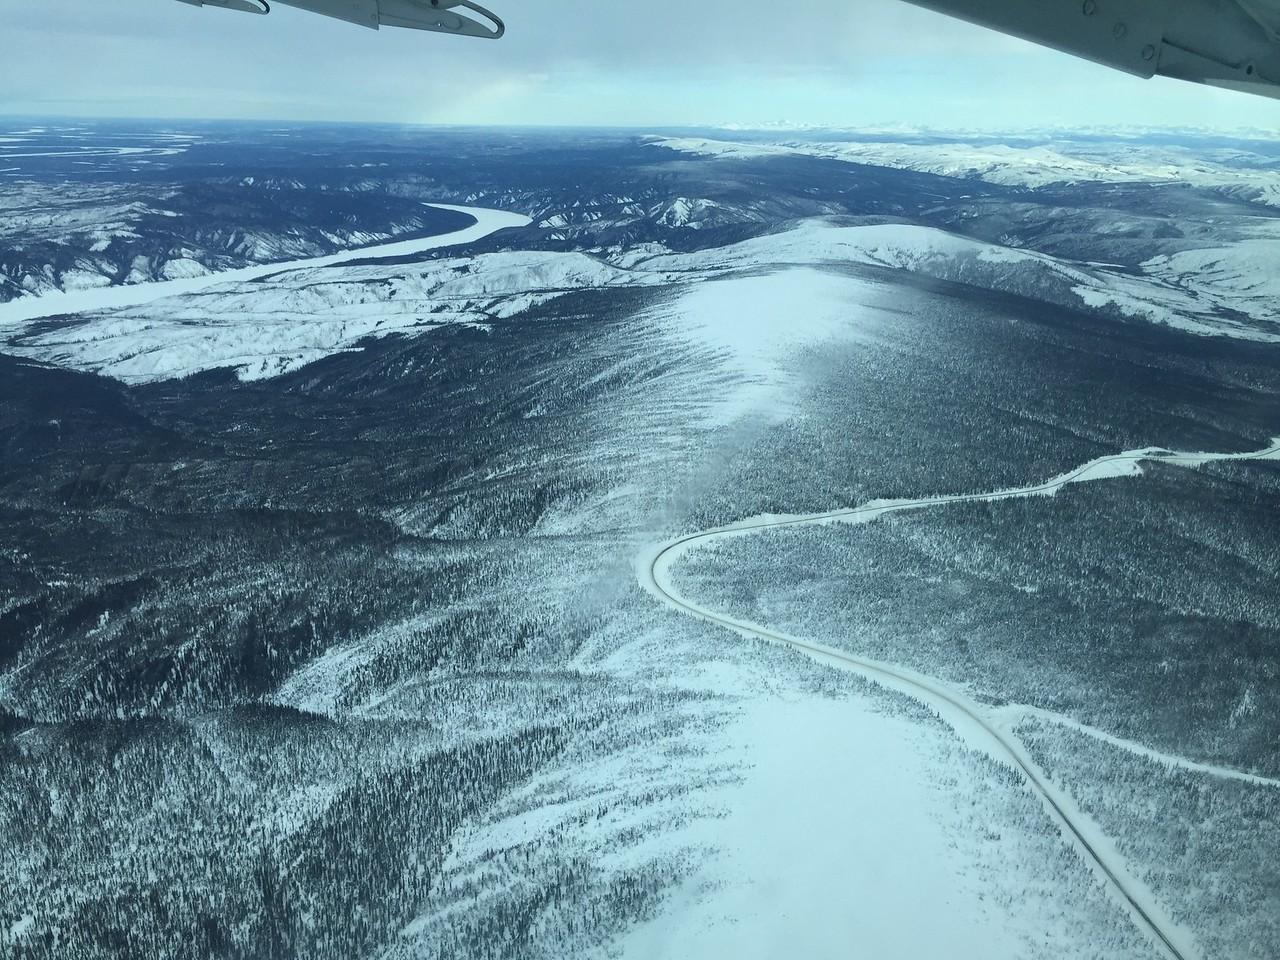 Aerial view of Dalton Hwy and Yukon River